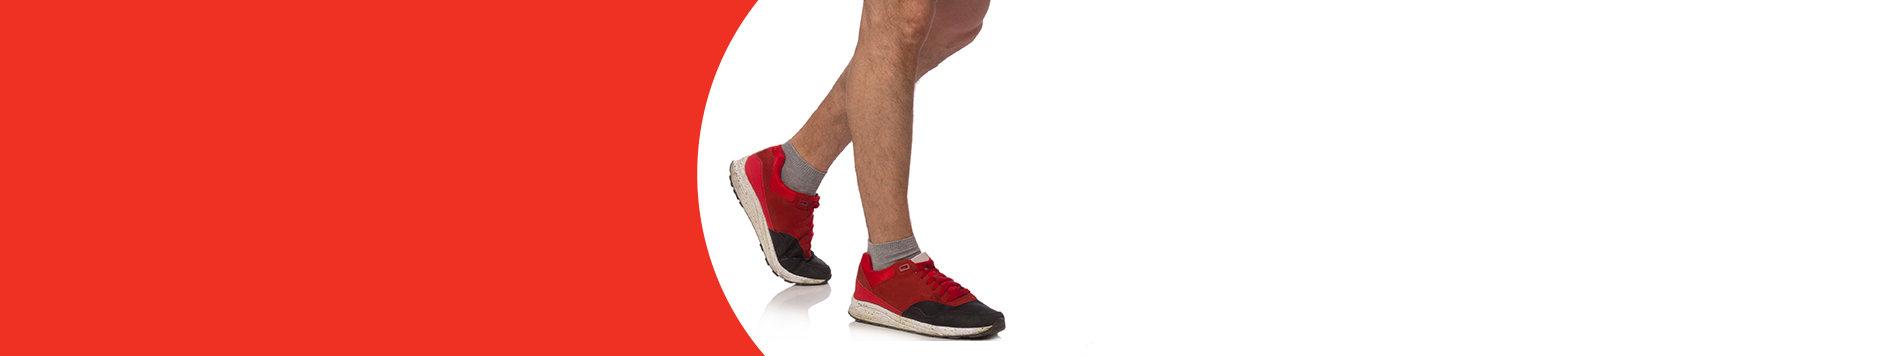 Comfort and sport shoes for men נעלי נוחות וספורט גברים